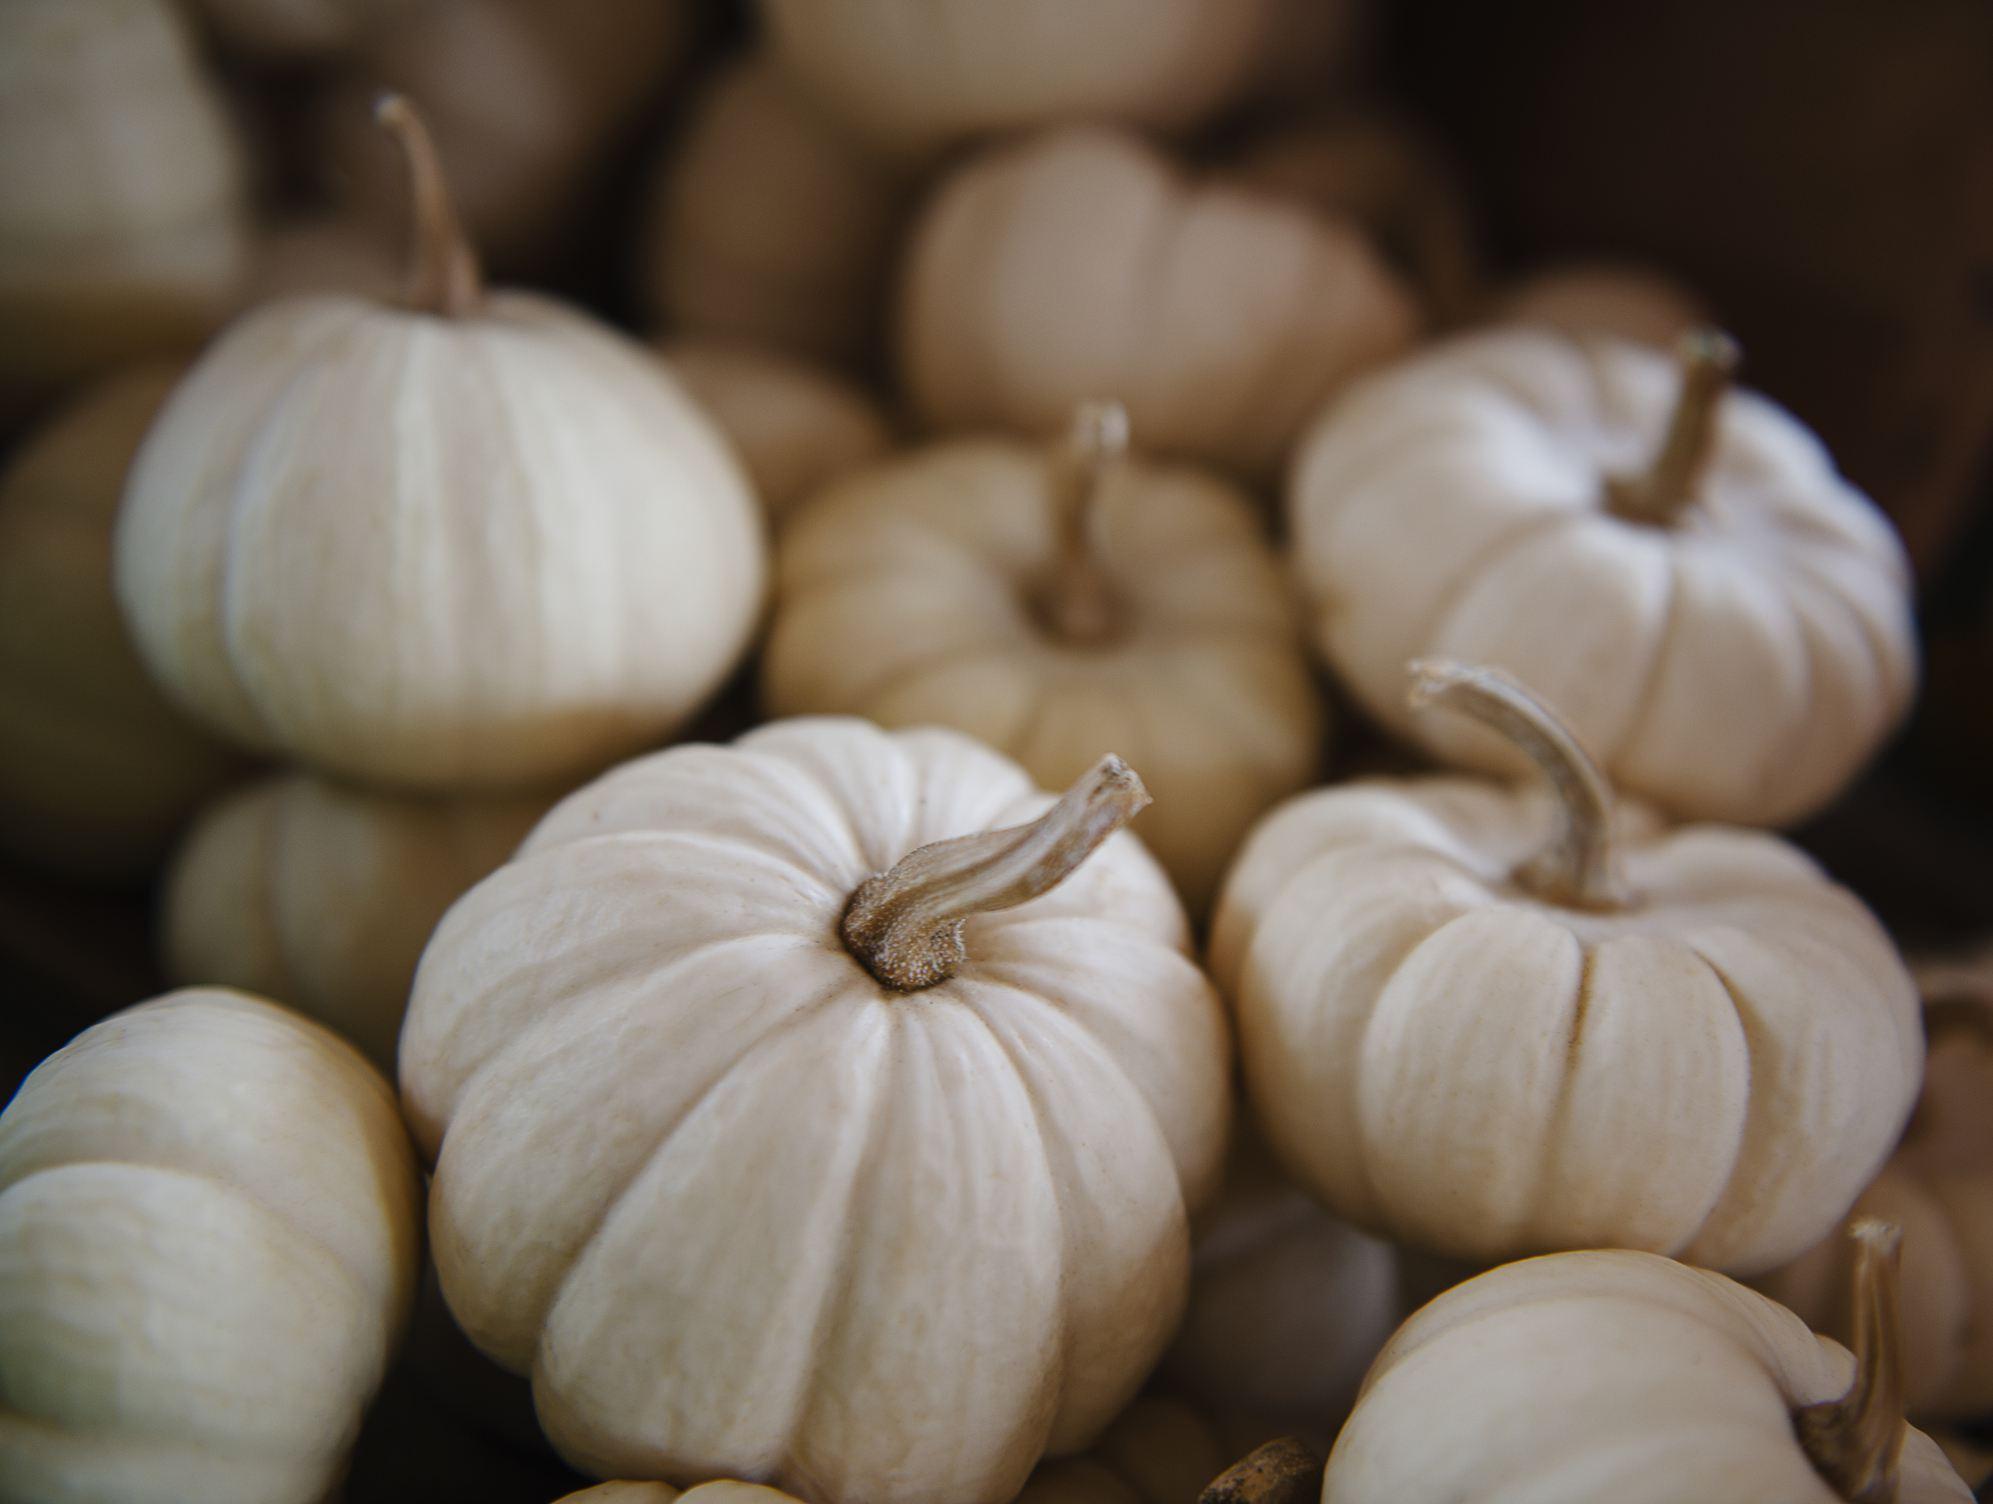 Small white pumpkins